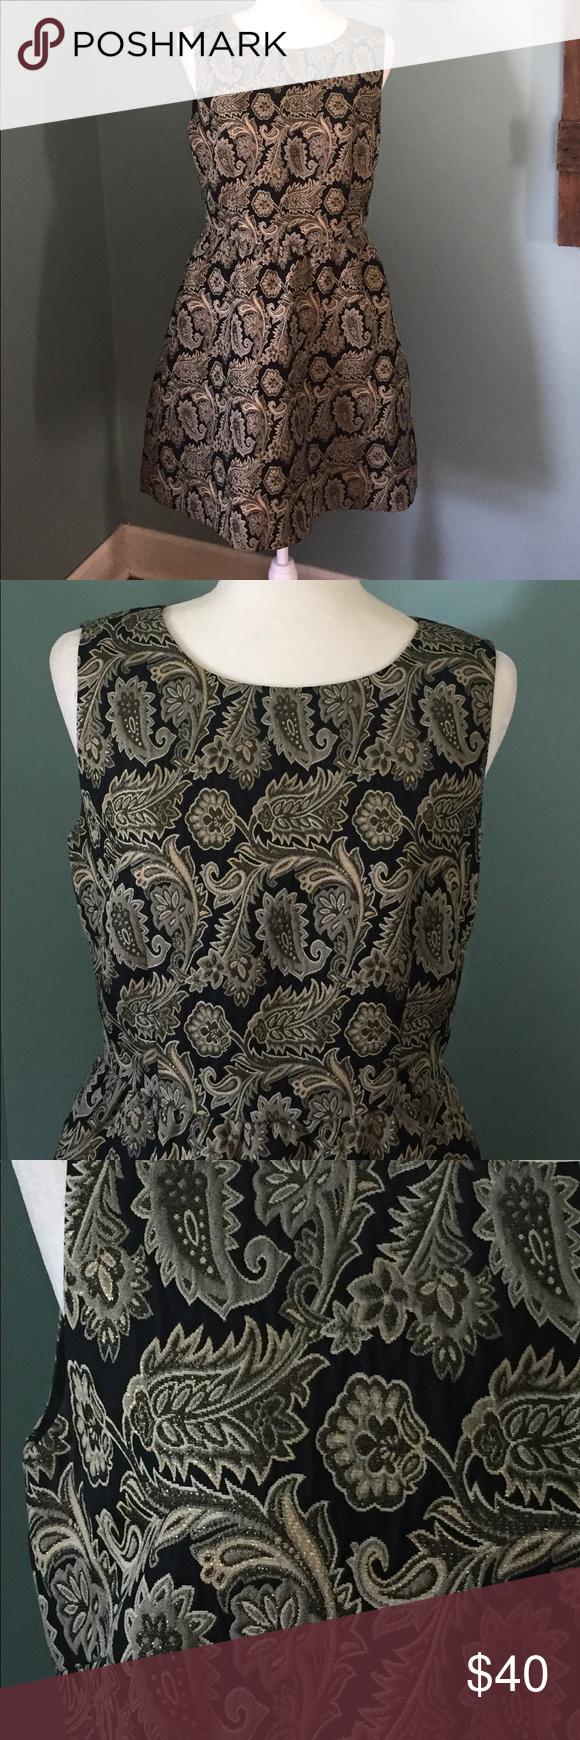 Cremieux brocade black gold dress size